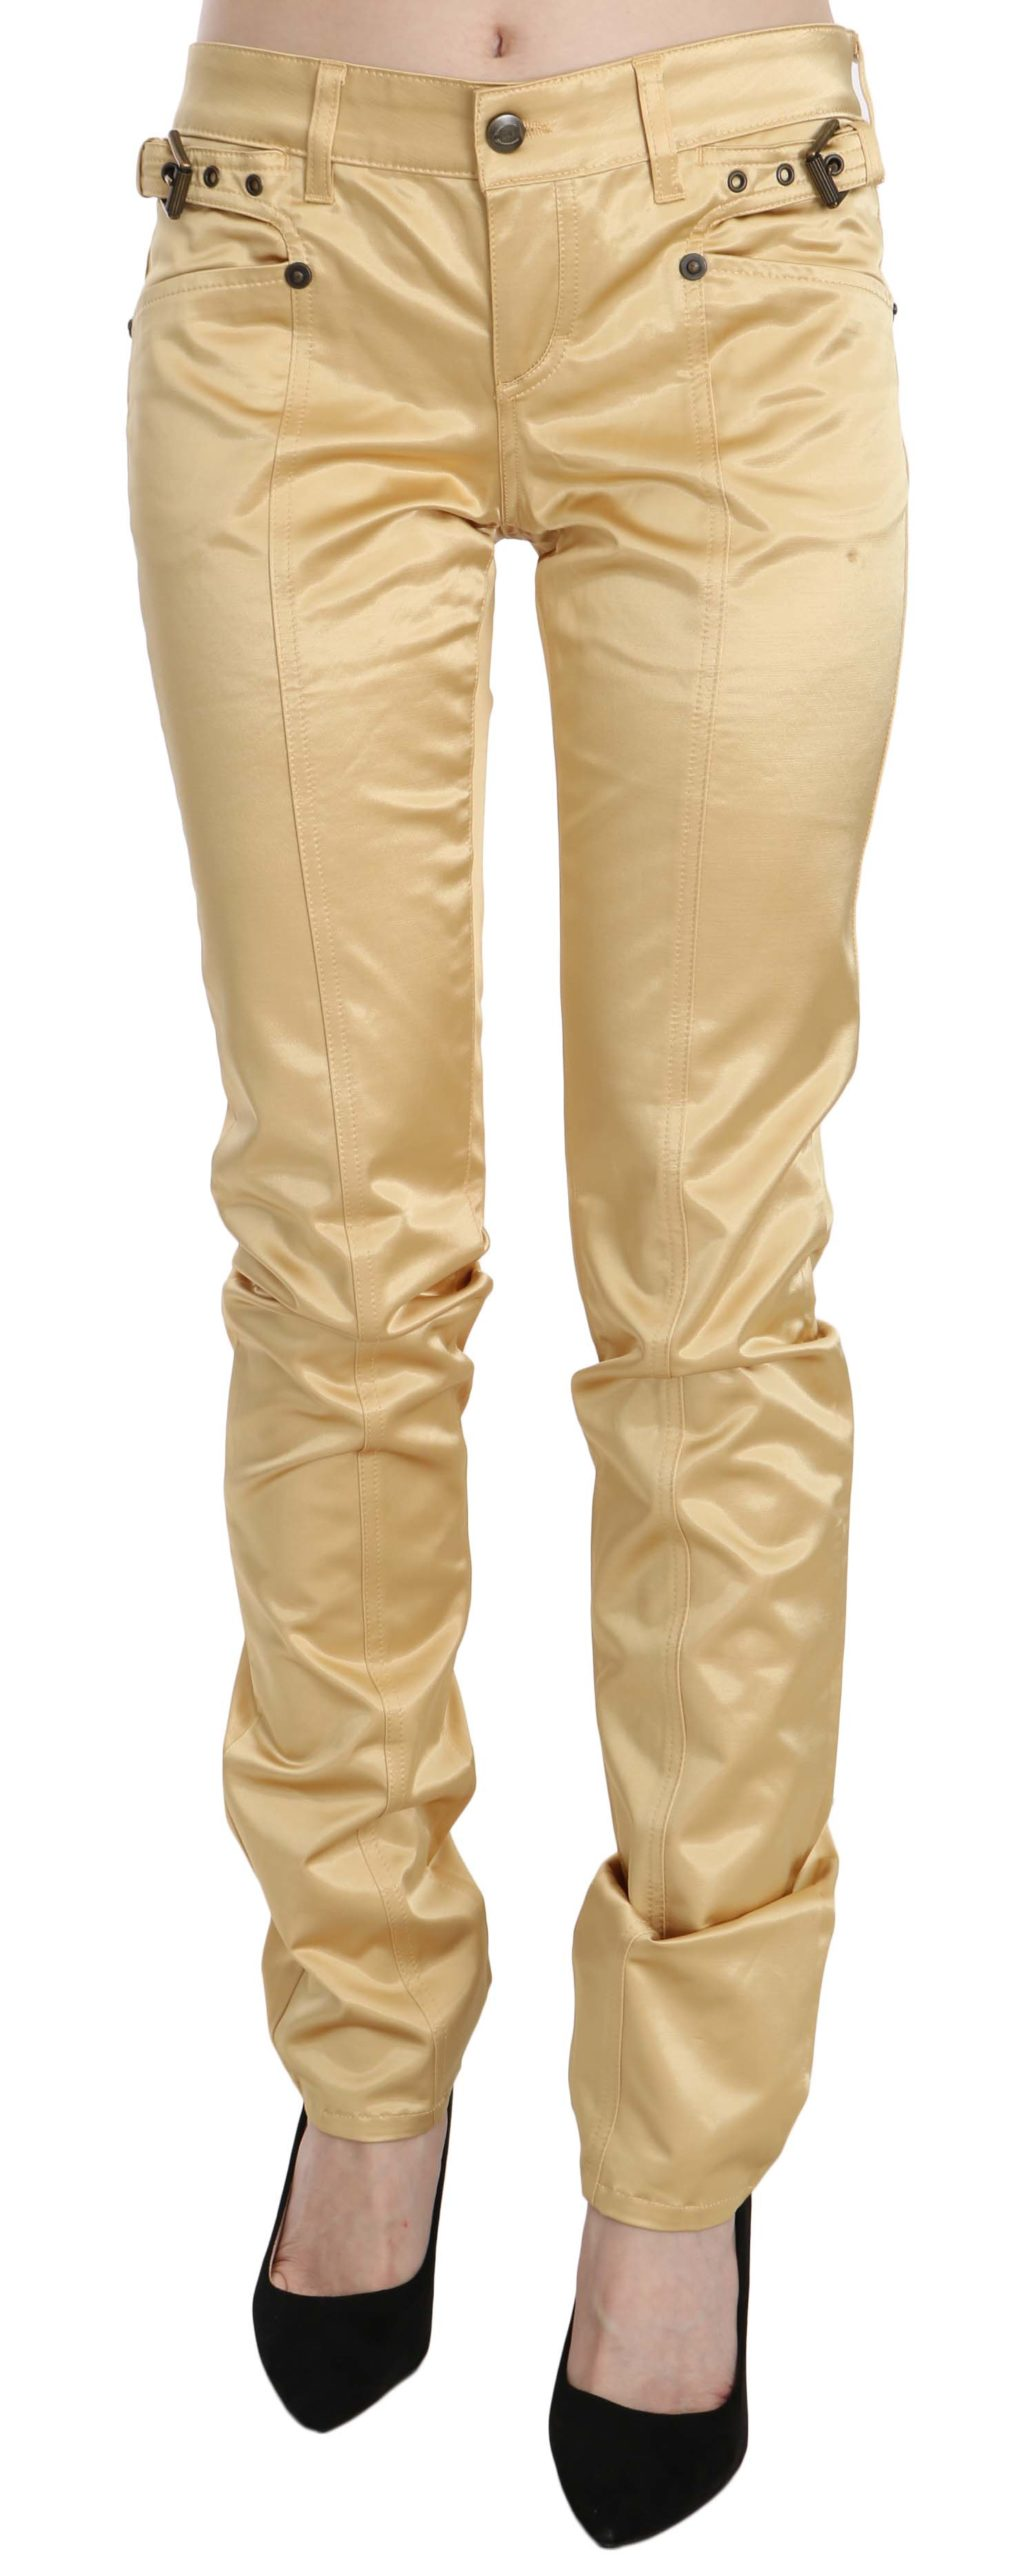 Just Cavalli Women's Mid Waist Slim Fit Trouser Cream PAN70346 - IT42 M